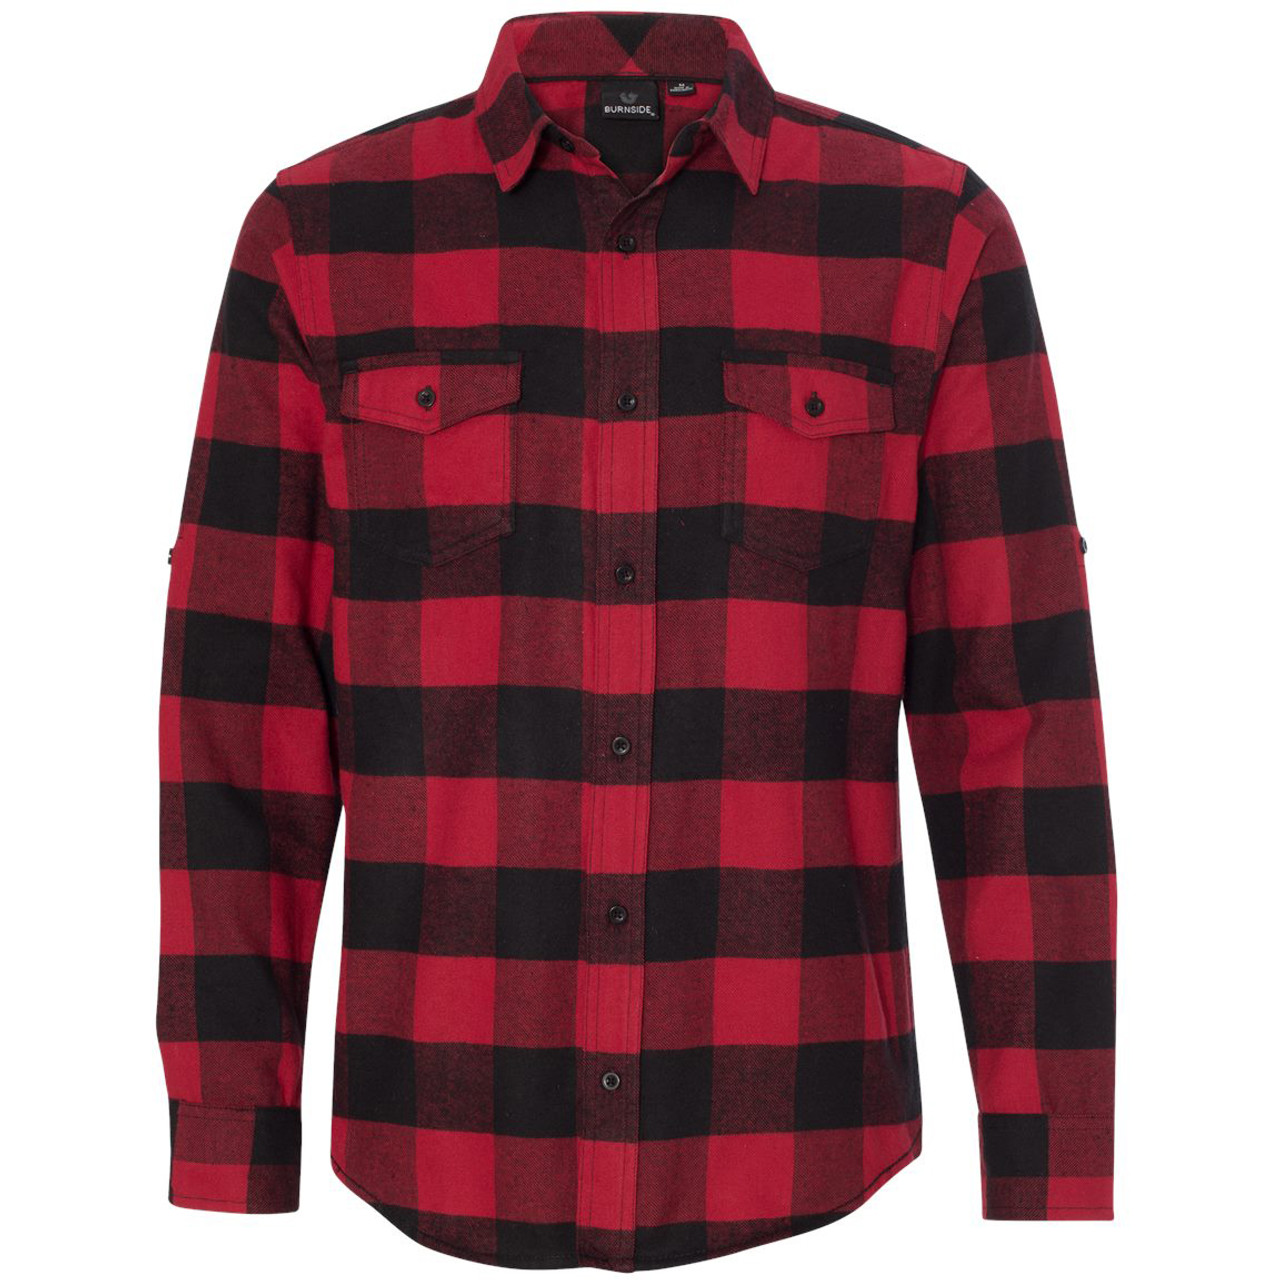 Red/Black Buffalo - 8210 Burnside Men's Woven Plaid Flannel | T-shirt.ca